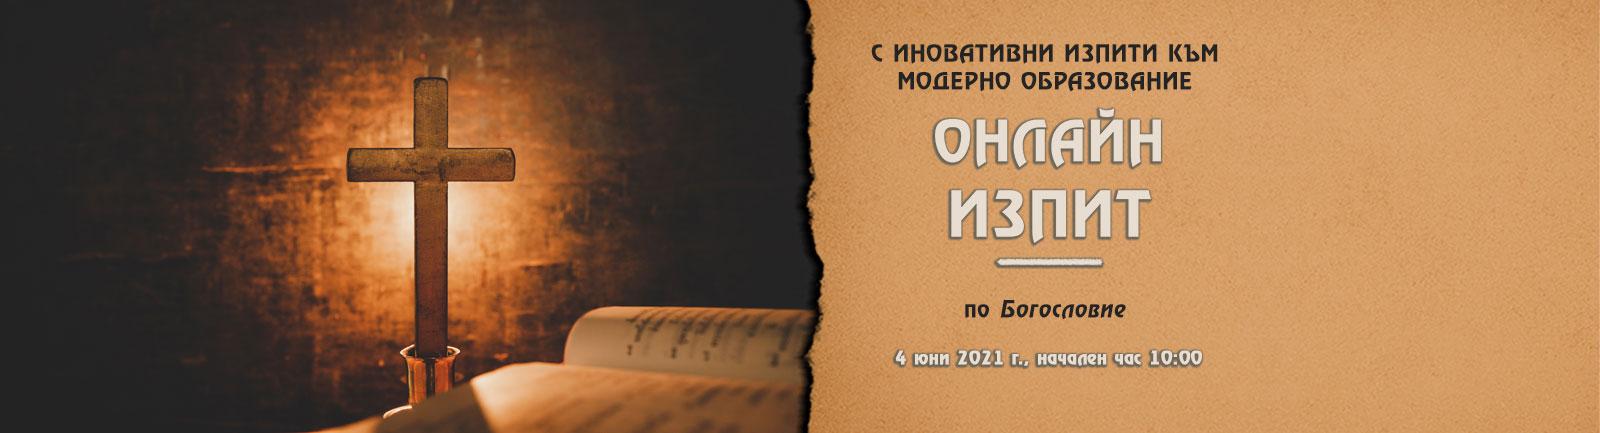 onlain-izpit-bogoslovie-04062021